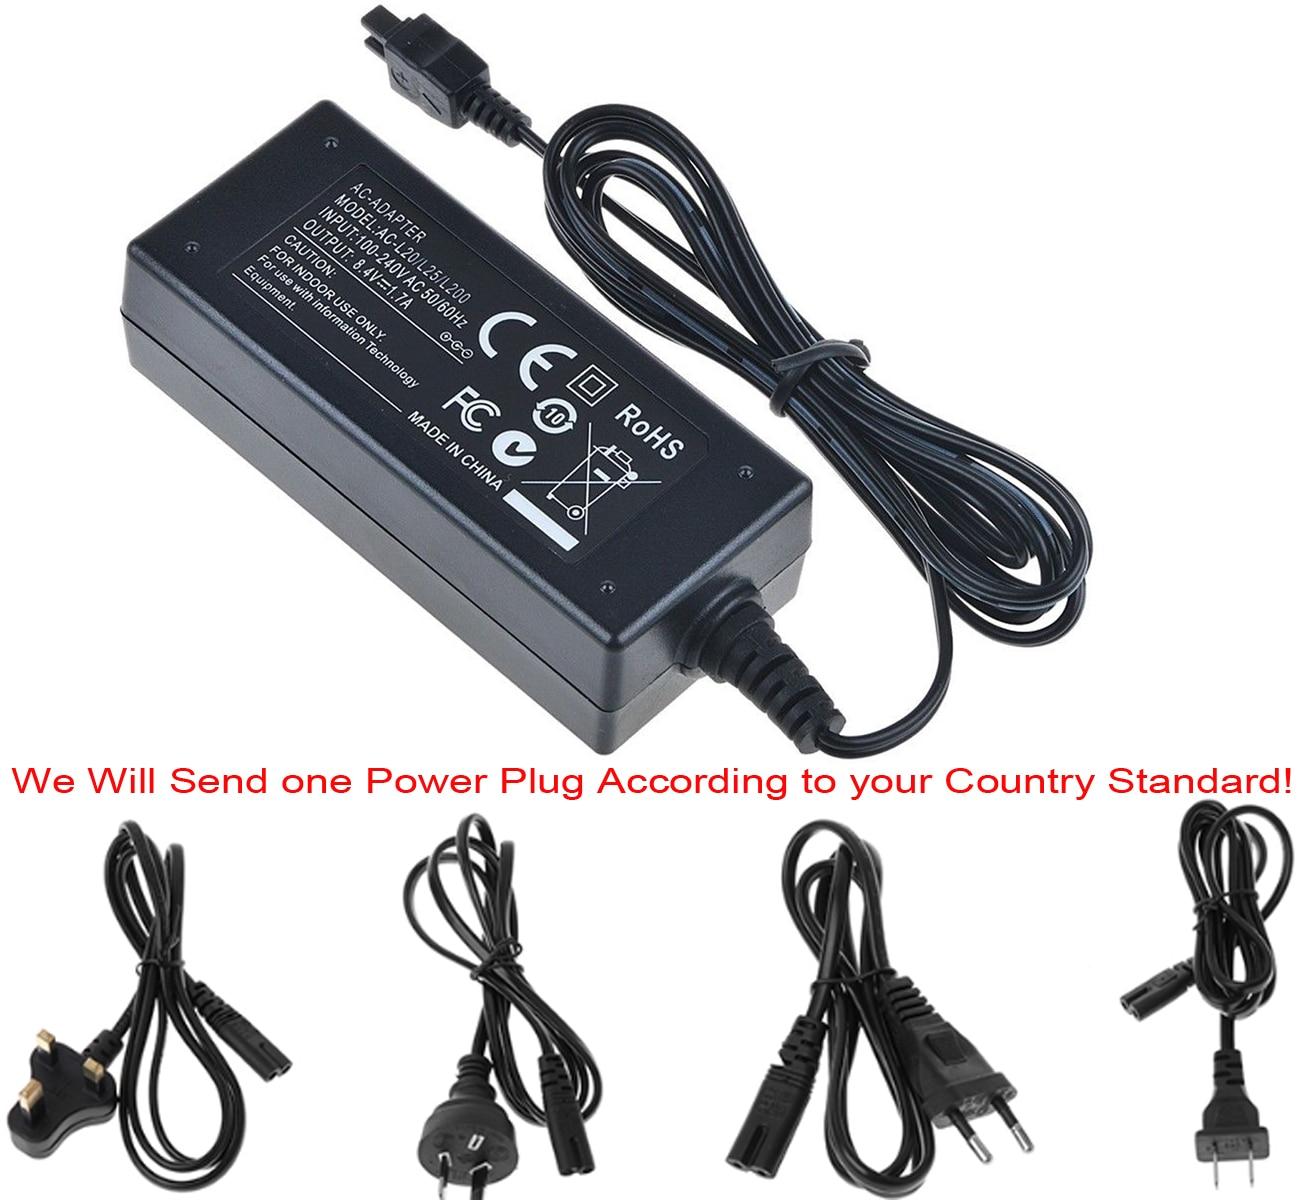 AC Cargador/adaptador de corriente para Sony DCR-SR60E... DCR-SR62E... DCR-SR65E... DCR-SR67E... DCR-SR68E... DCR-SR78E Cámaras grabadoras Handycam